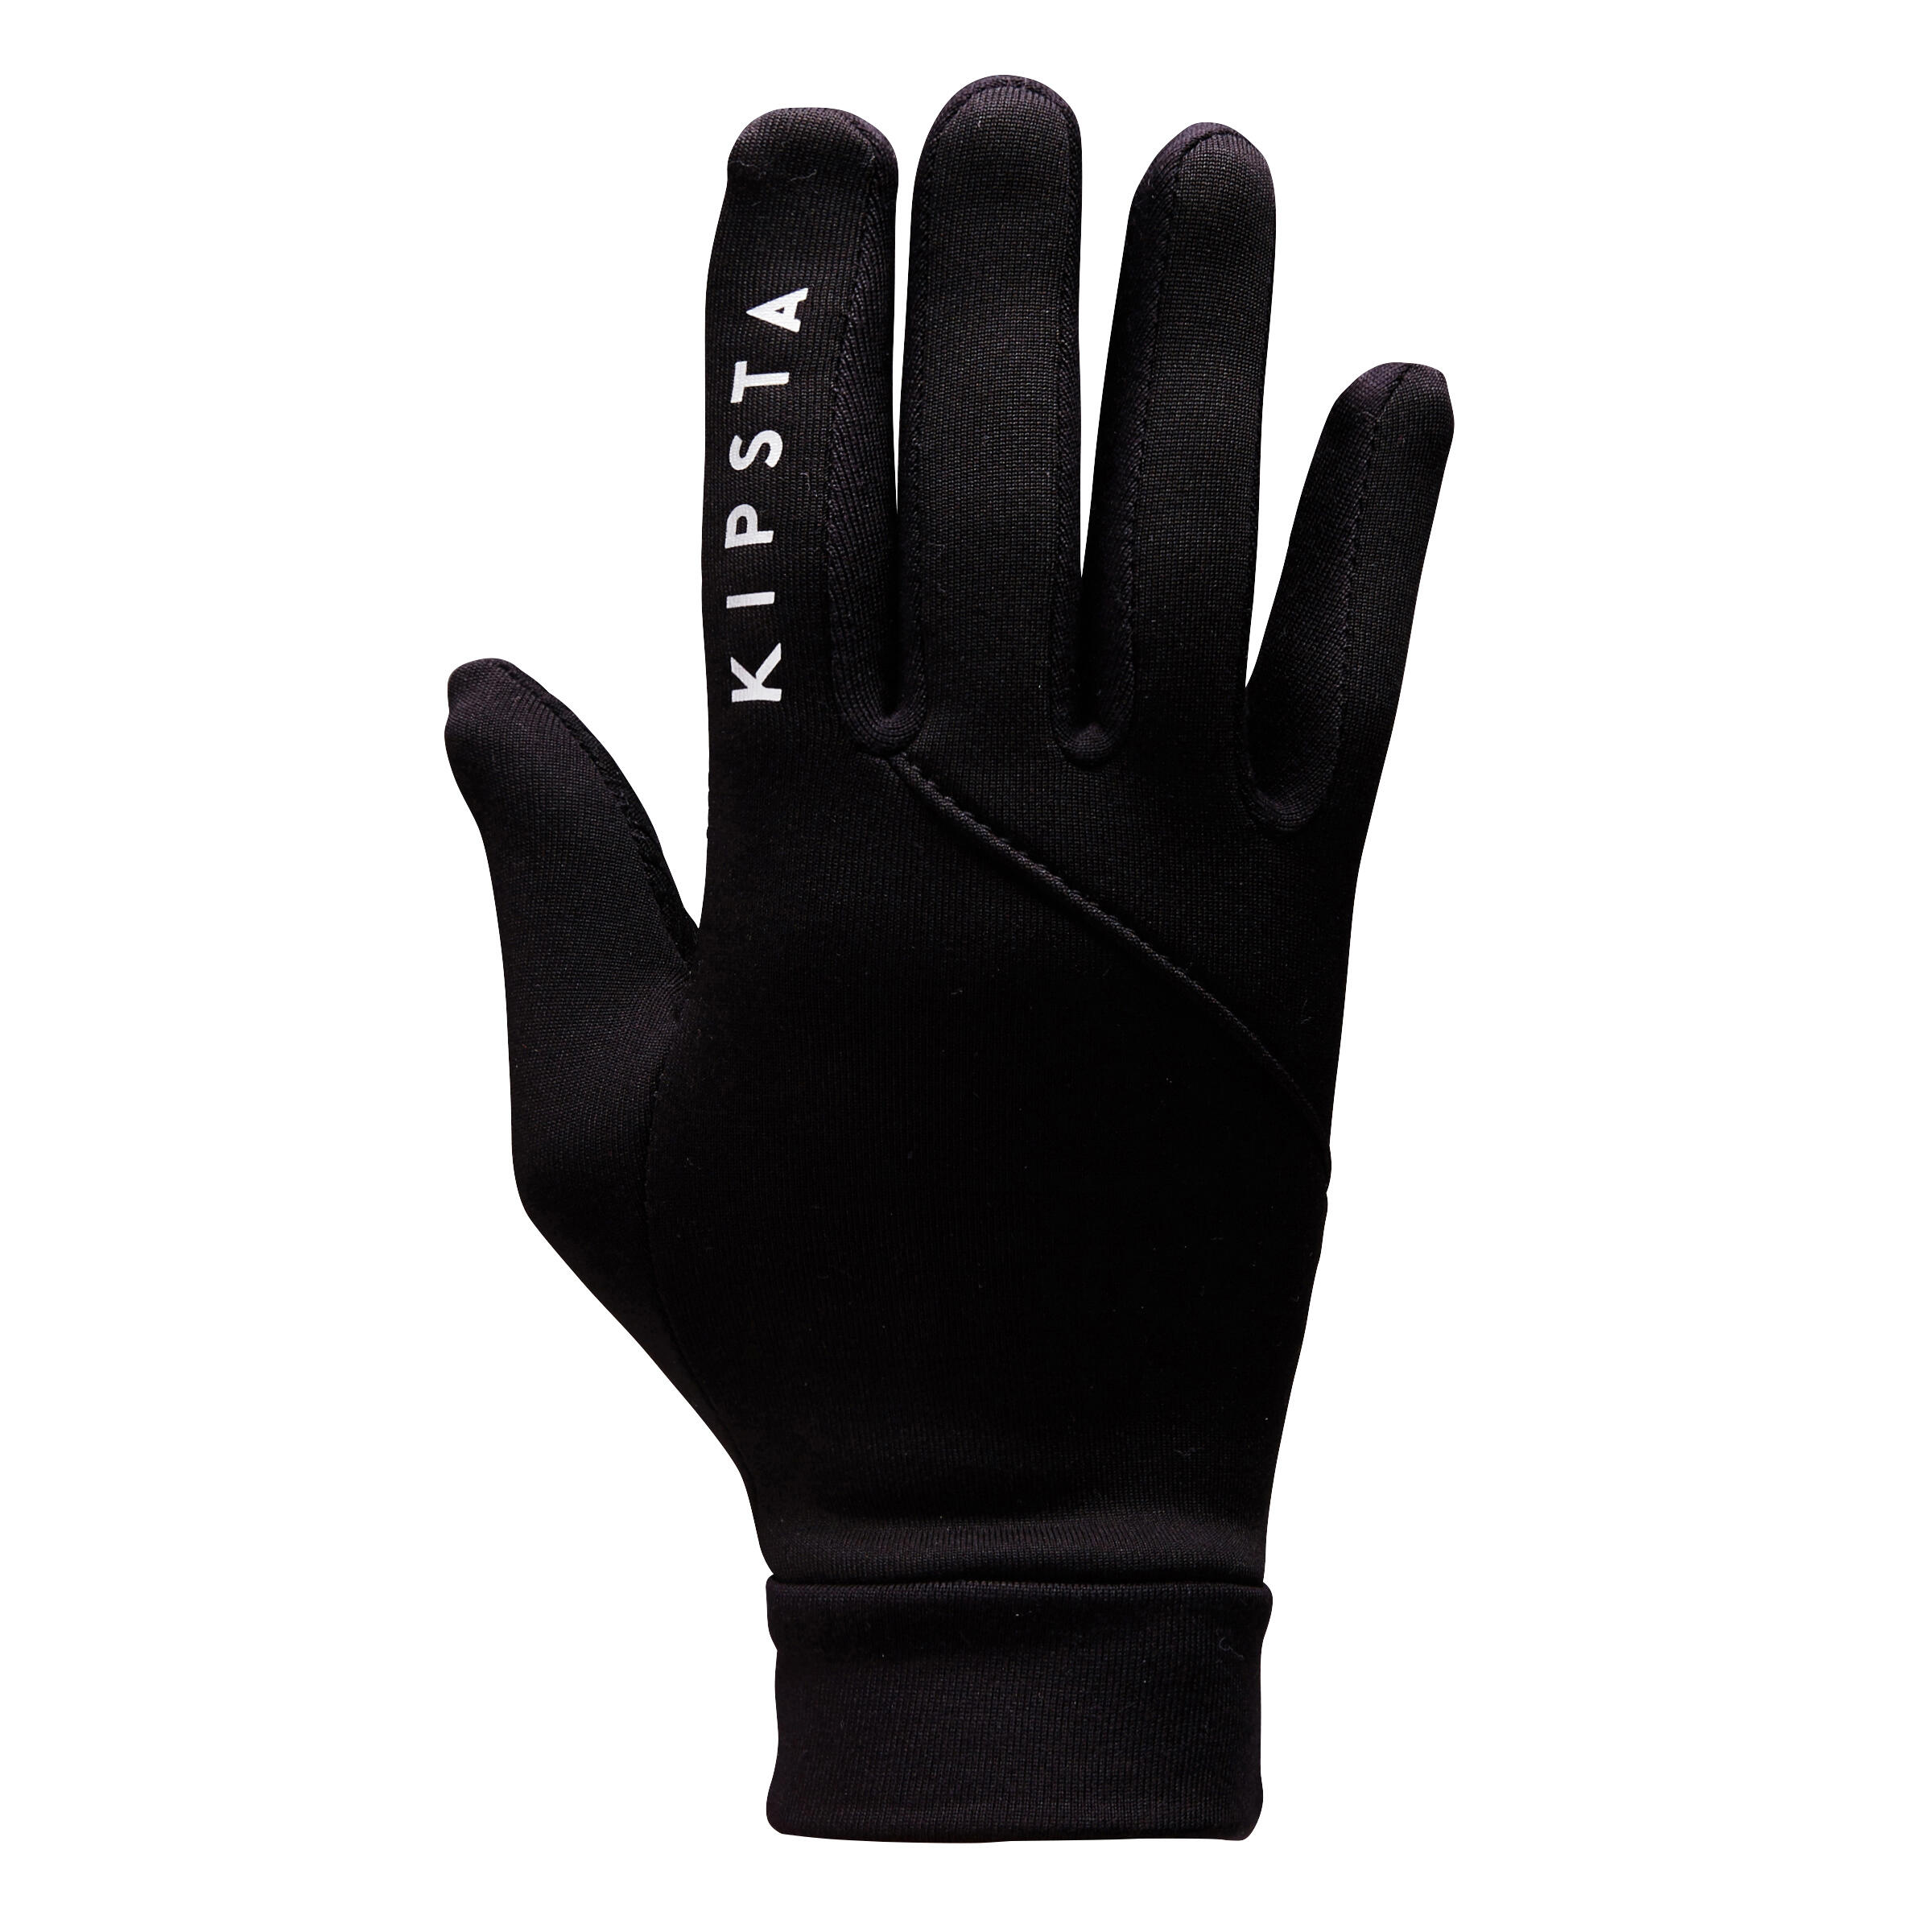 Handschuhe Fussball Keepdry 500 Kinder schwarz